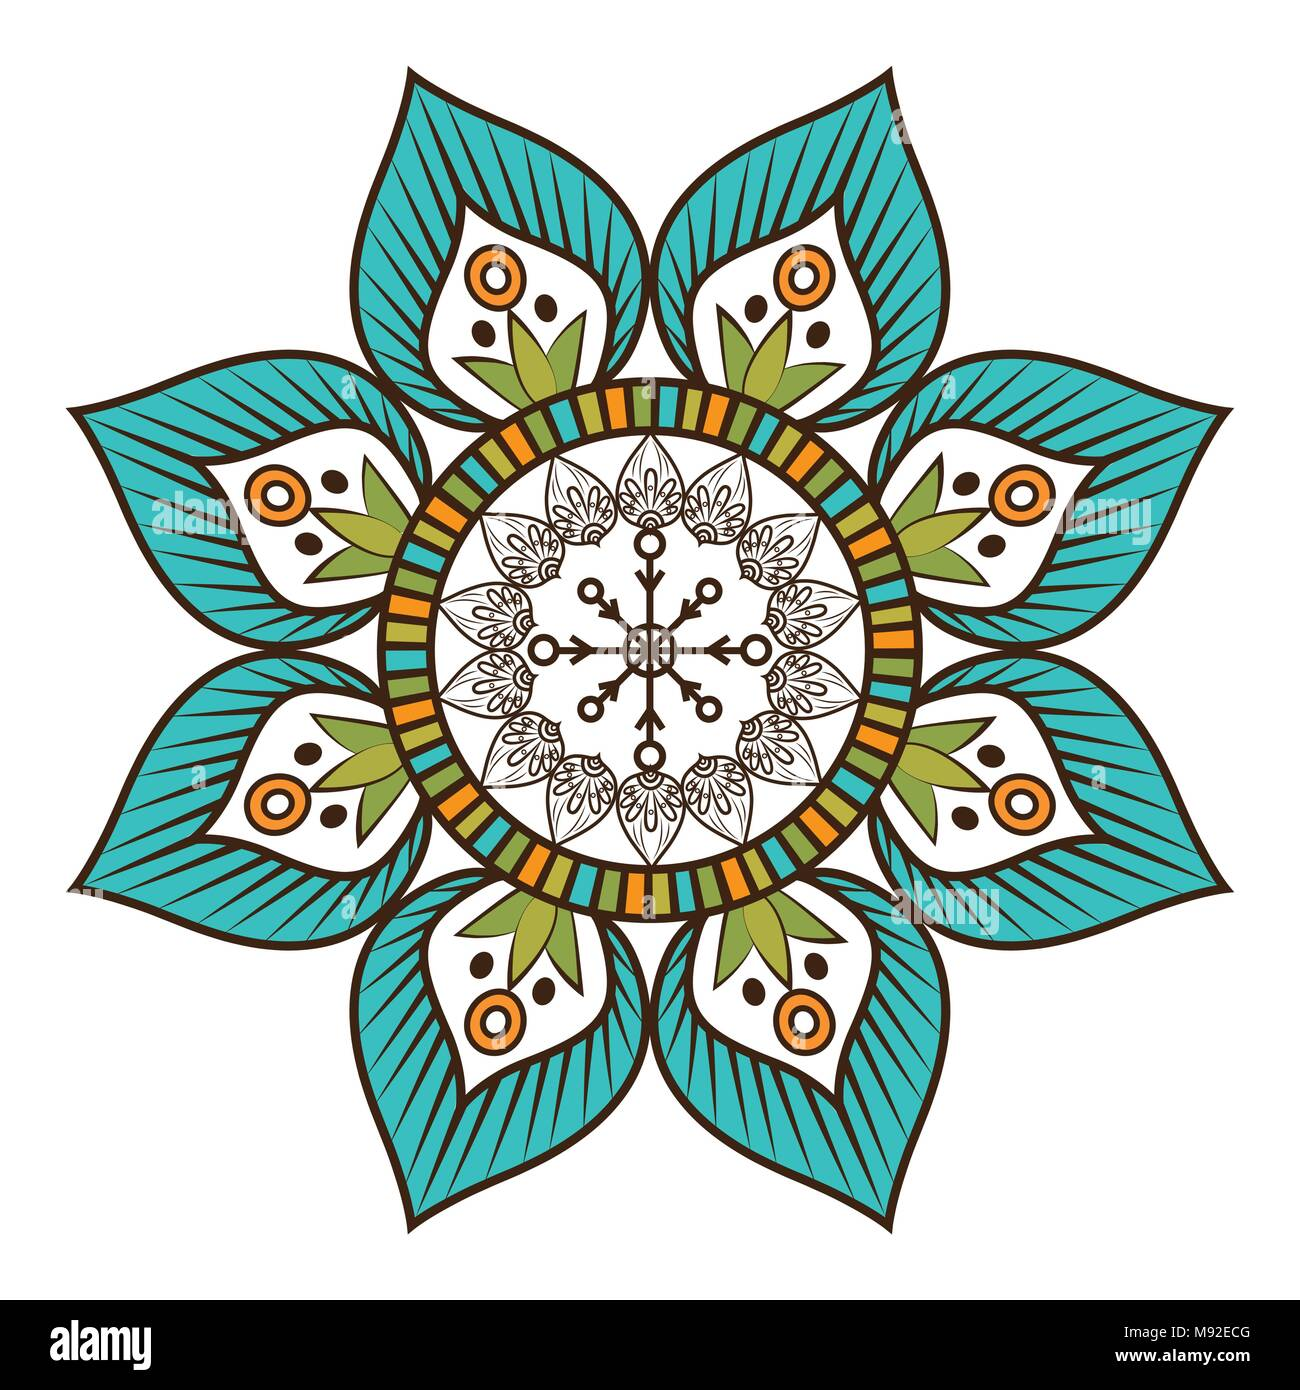 bohemian background design stock vector image art alamy https www alamy com bohemian background design image177690816 html